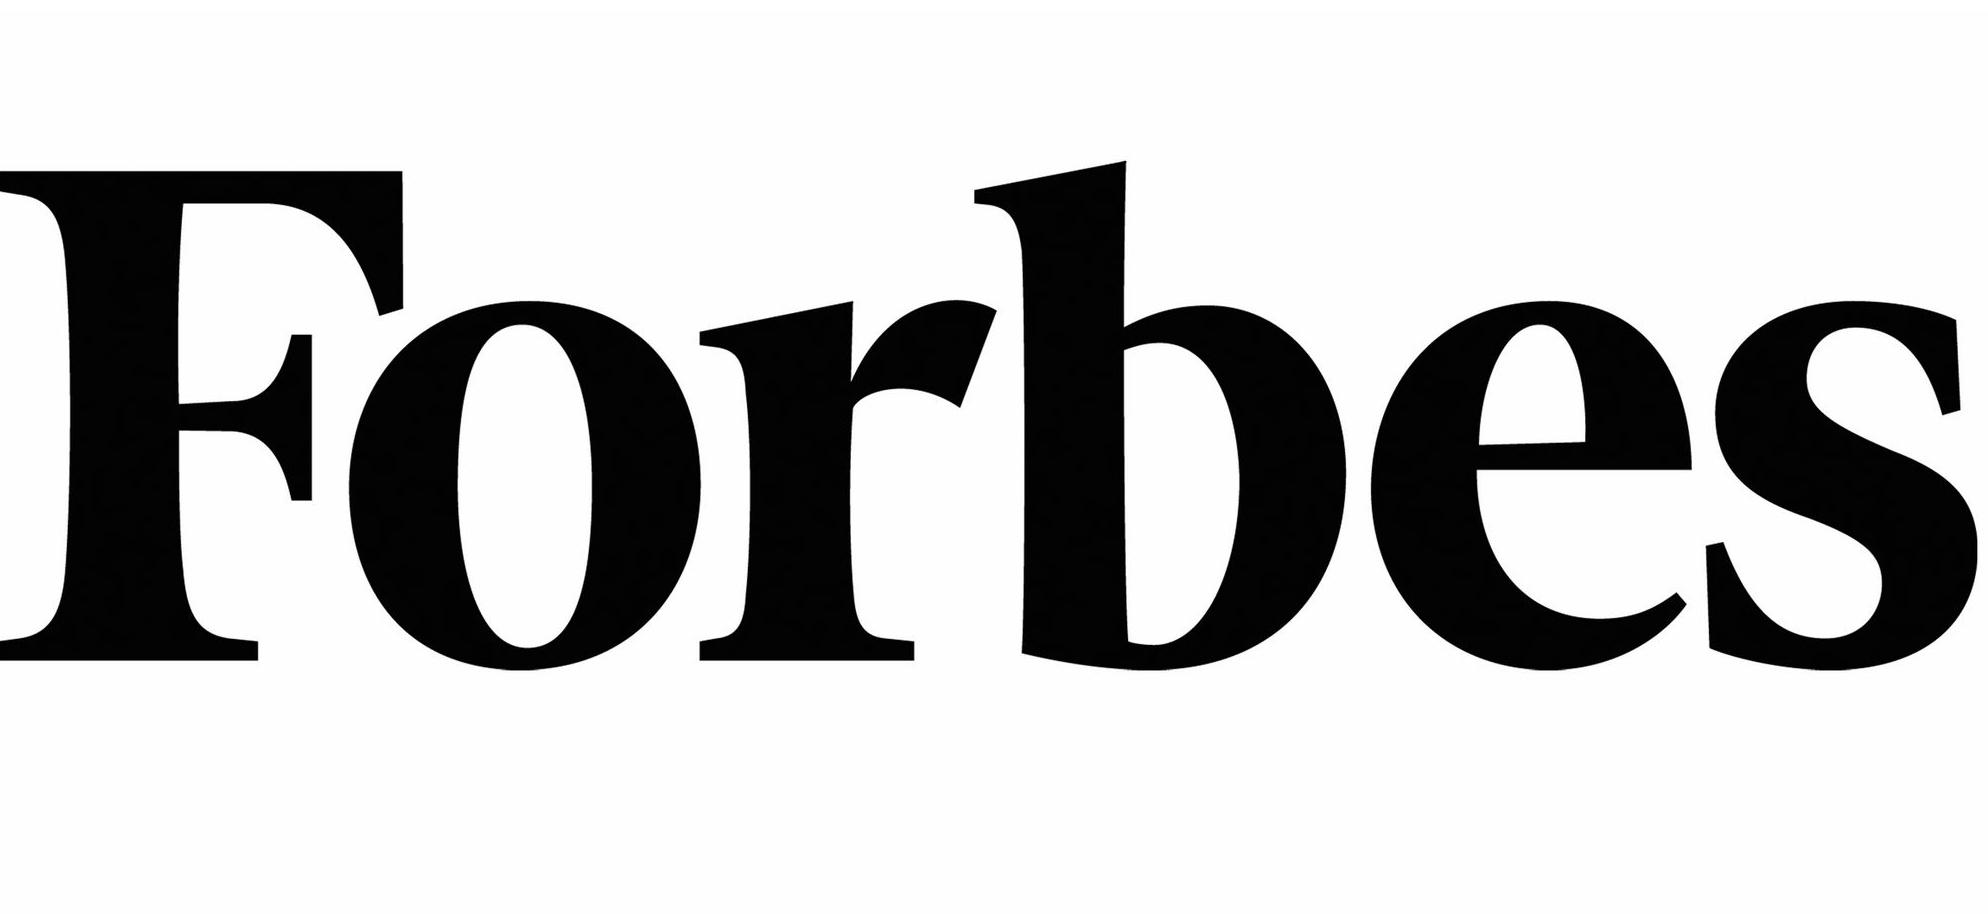 1-forbes-logo1.jpg